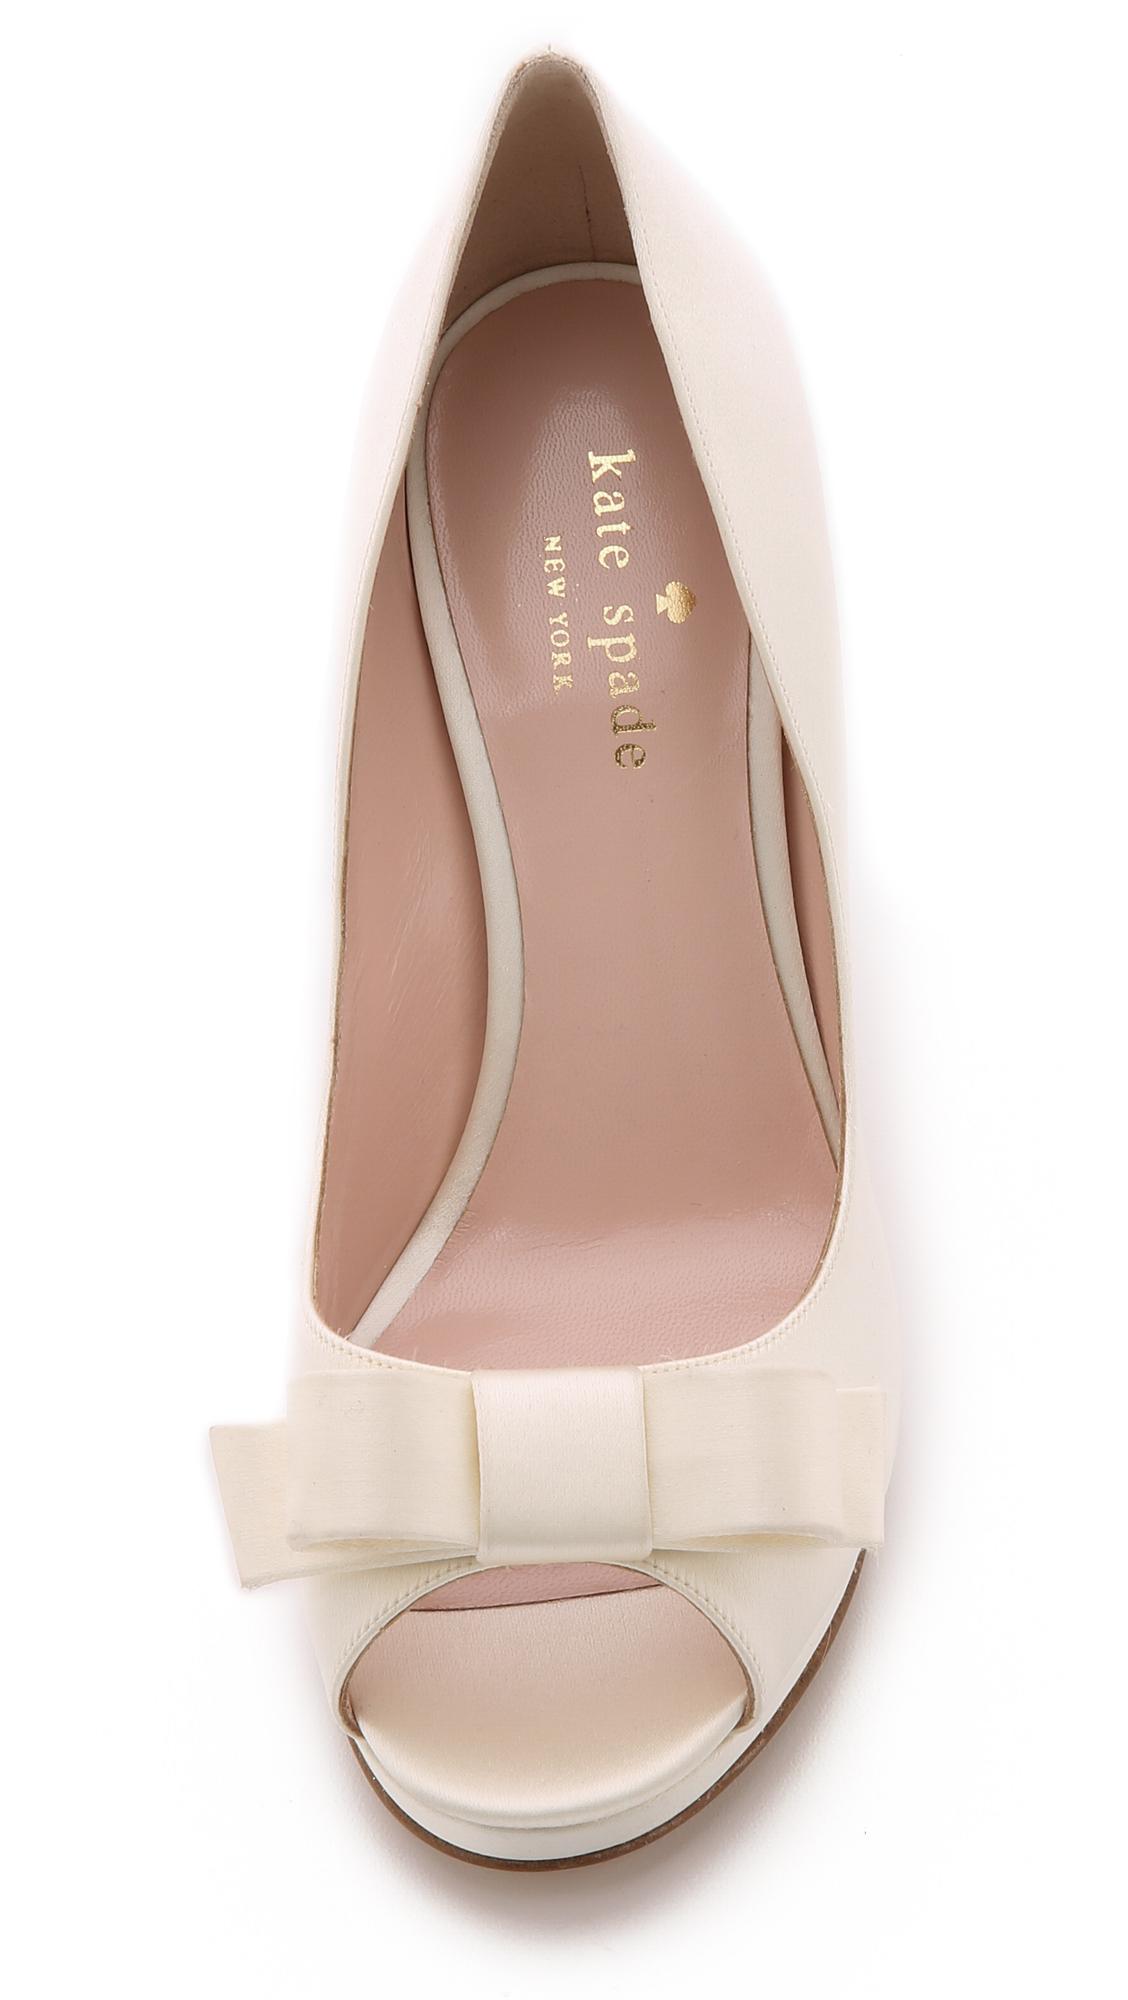 kate spade felisha bow peep toe pumps ivory in beige. Black Bedroom Furniture Sets. Home Design Ideas